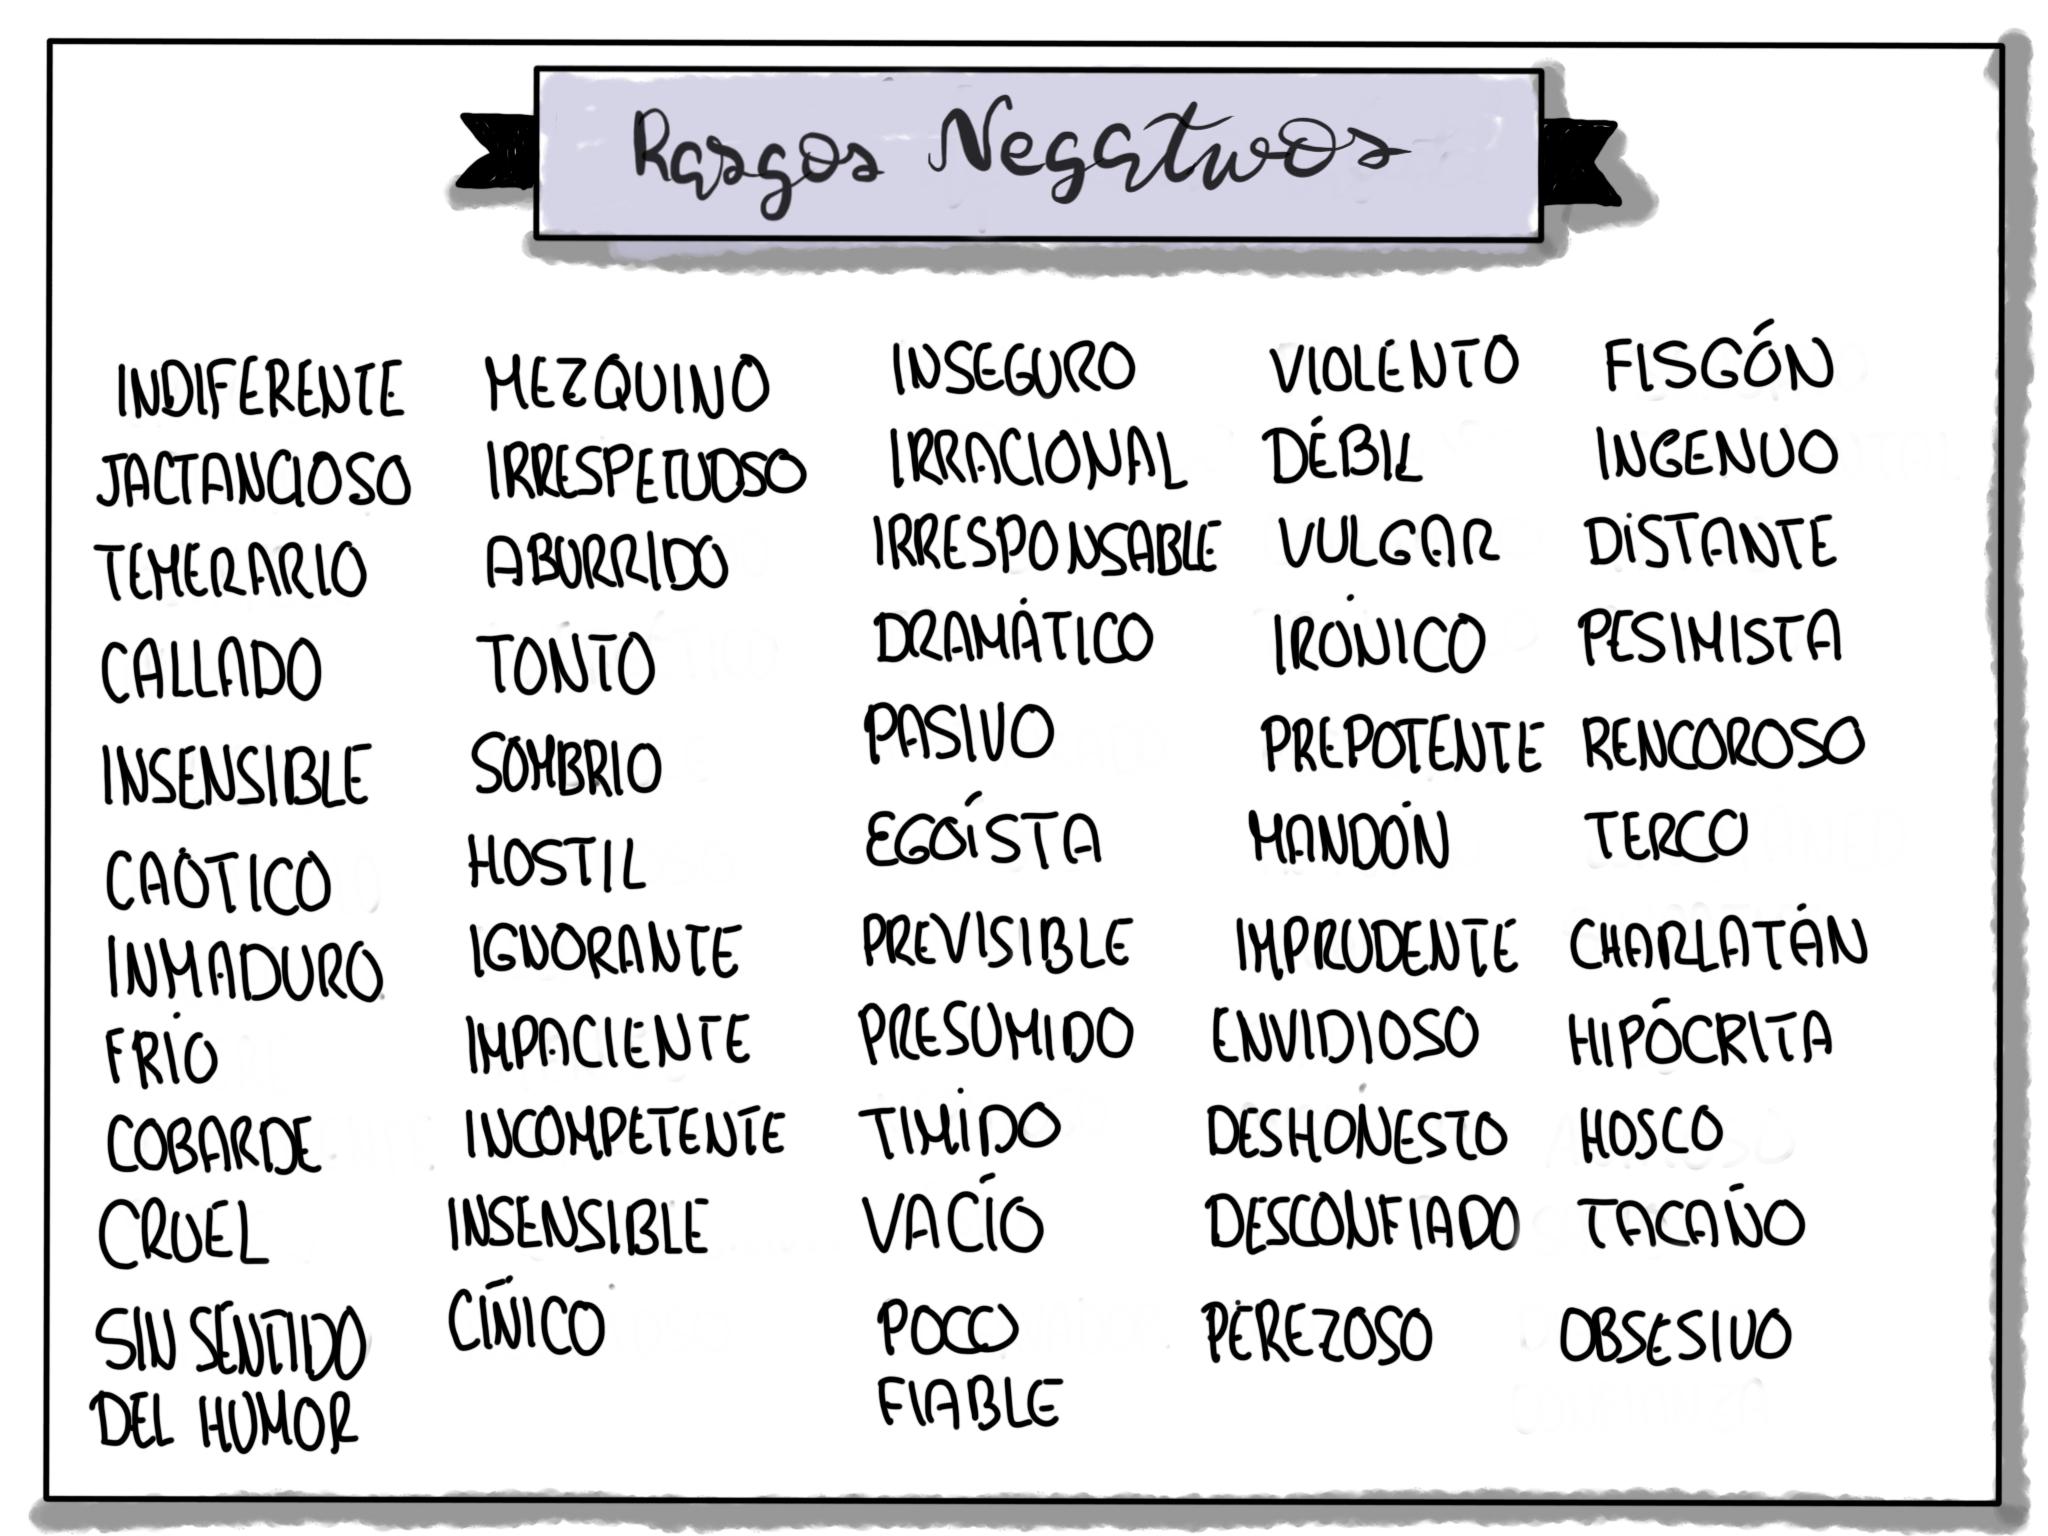 Rasgos negativos.png